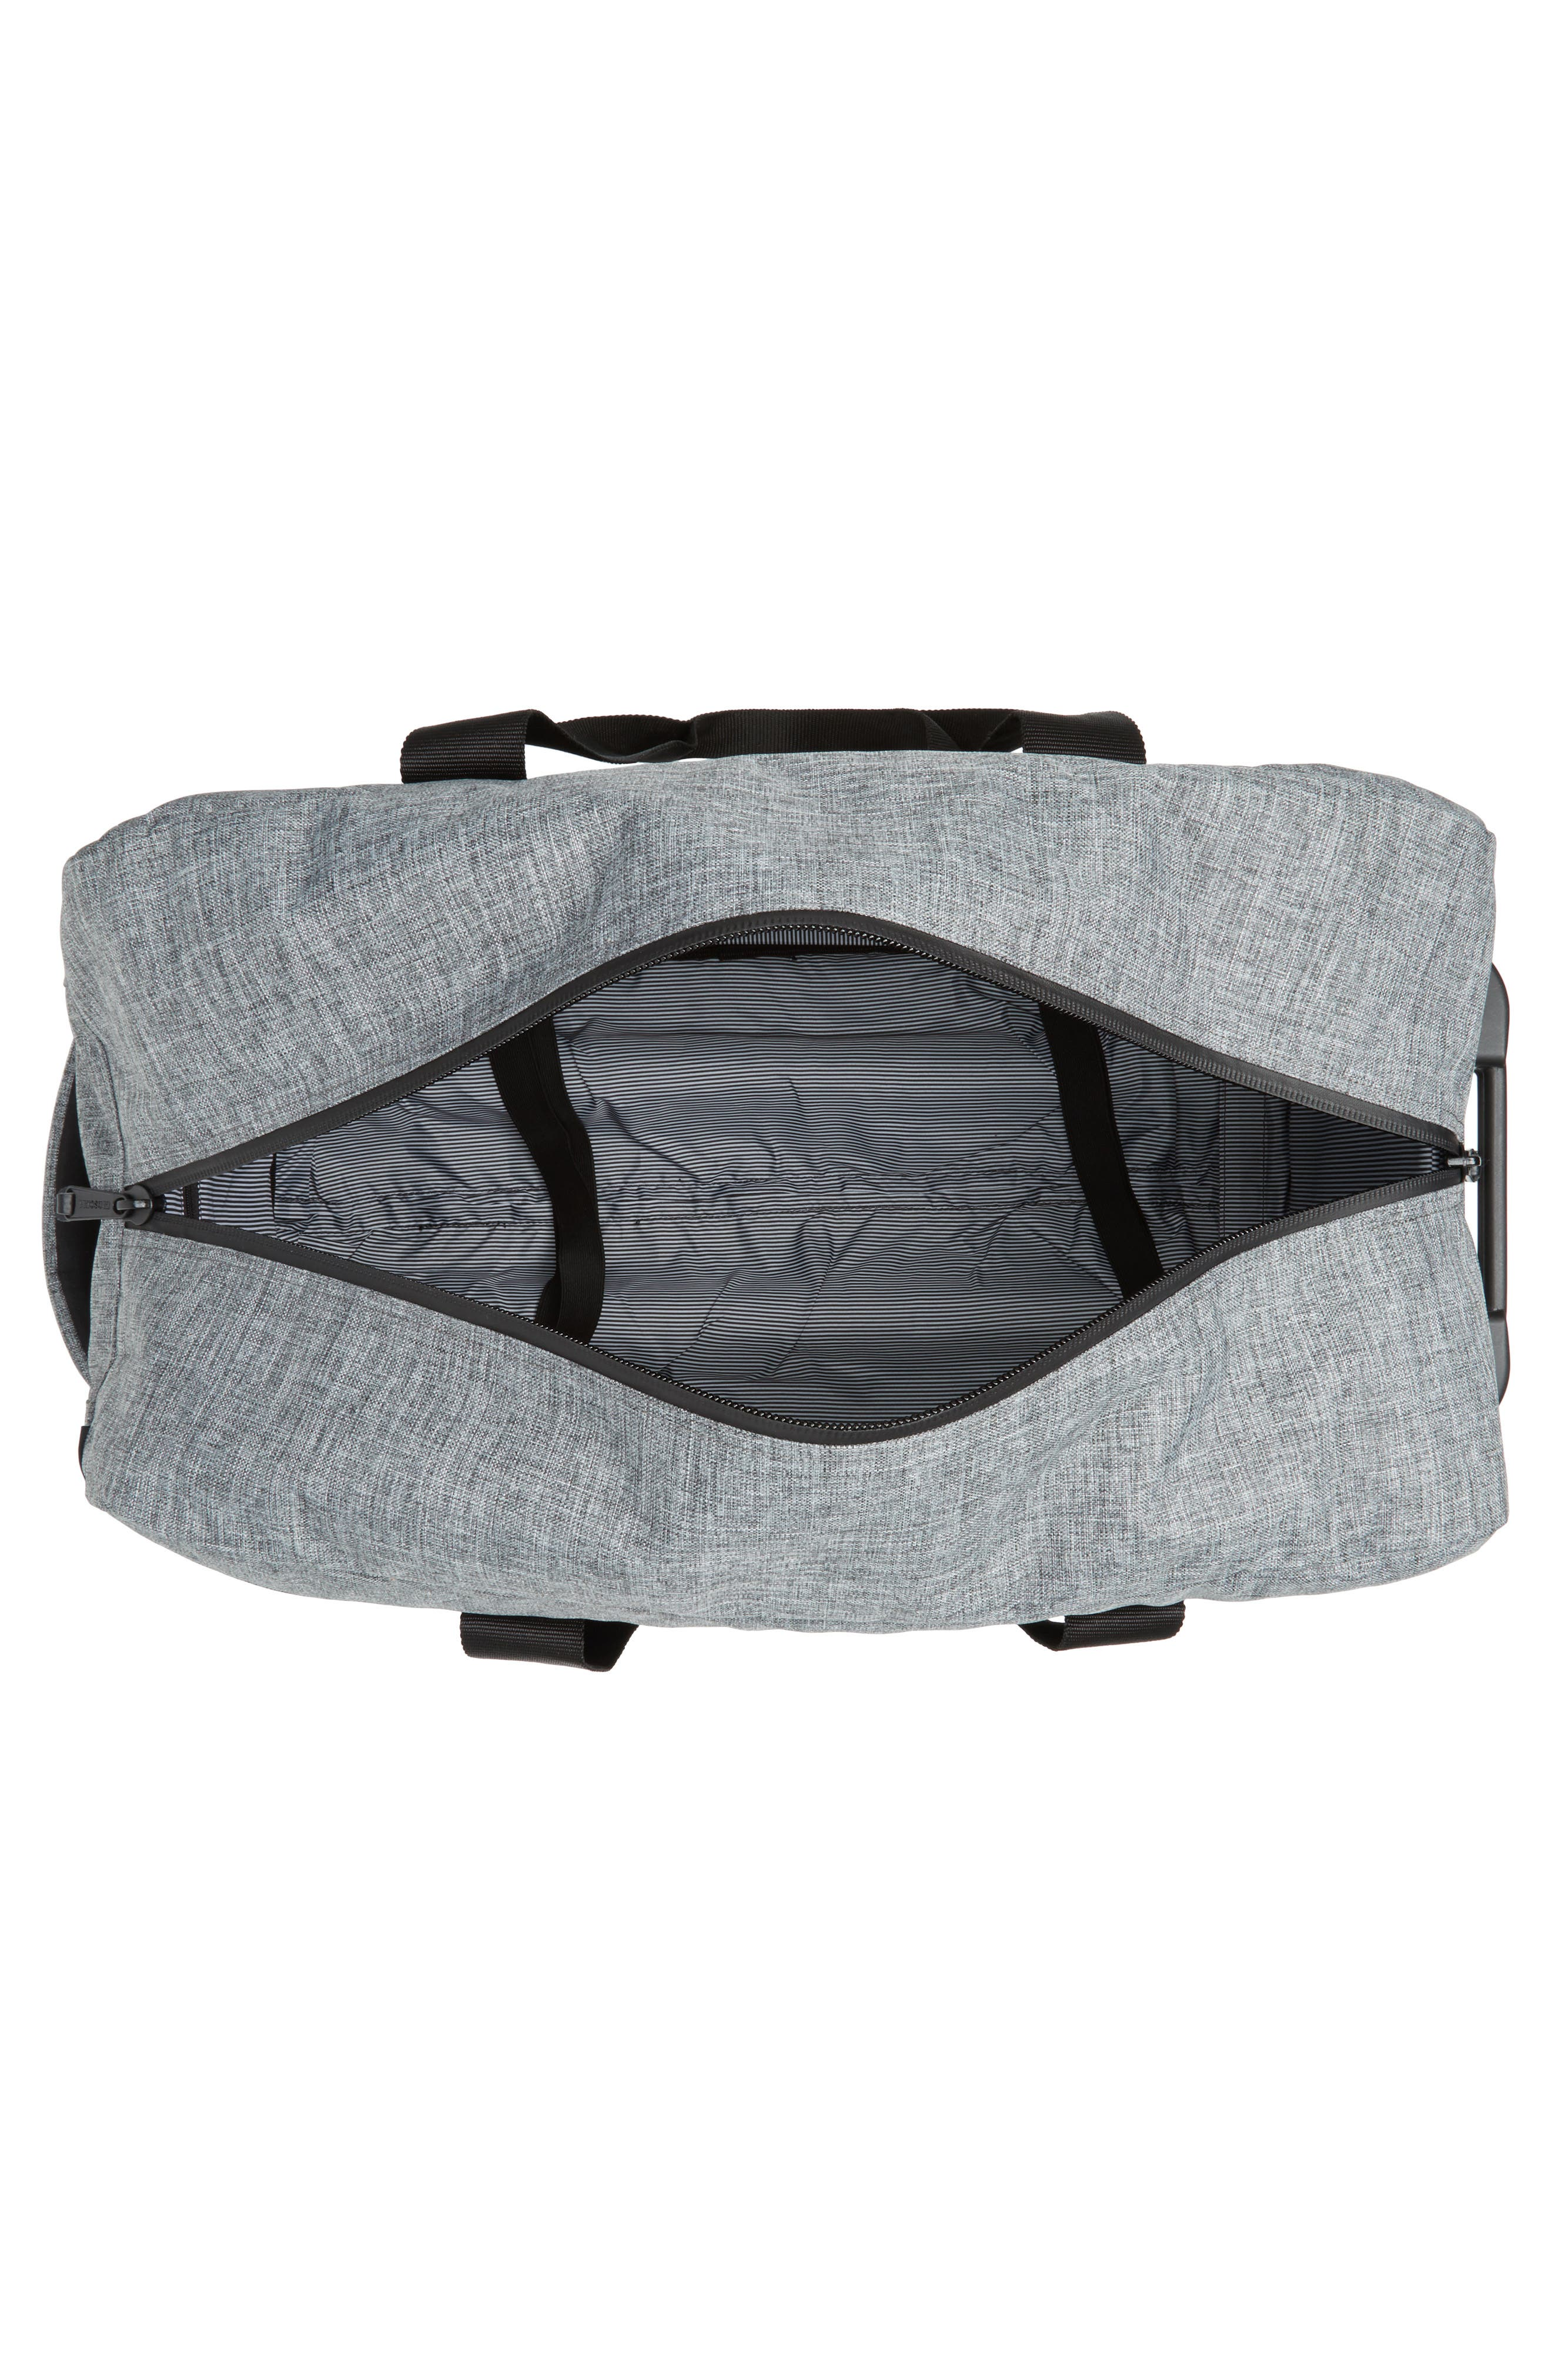 HERSCHEL SUPPLY CO., Wheelie Outfitter 24-Inch Duffel Bag, Alternate thumbnail 2, color, 084